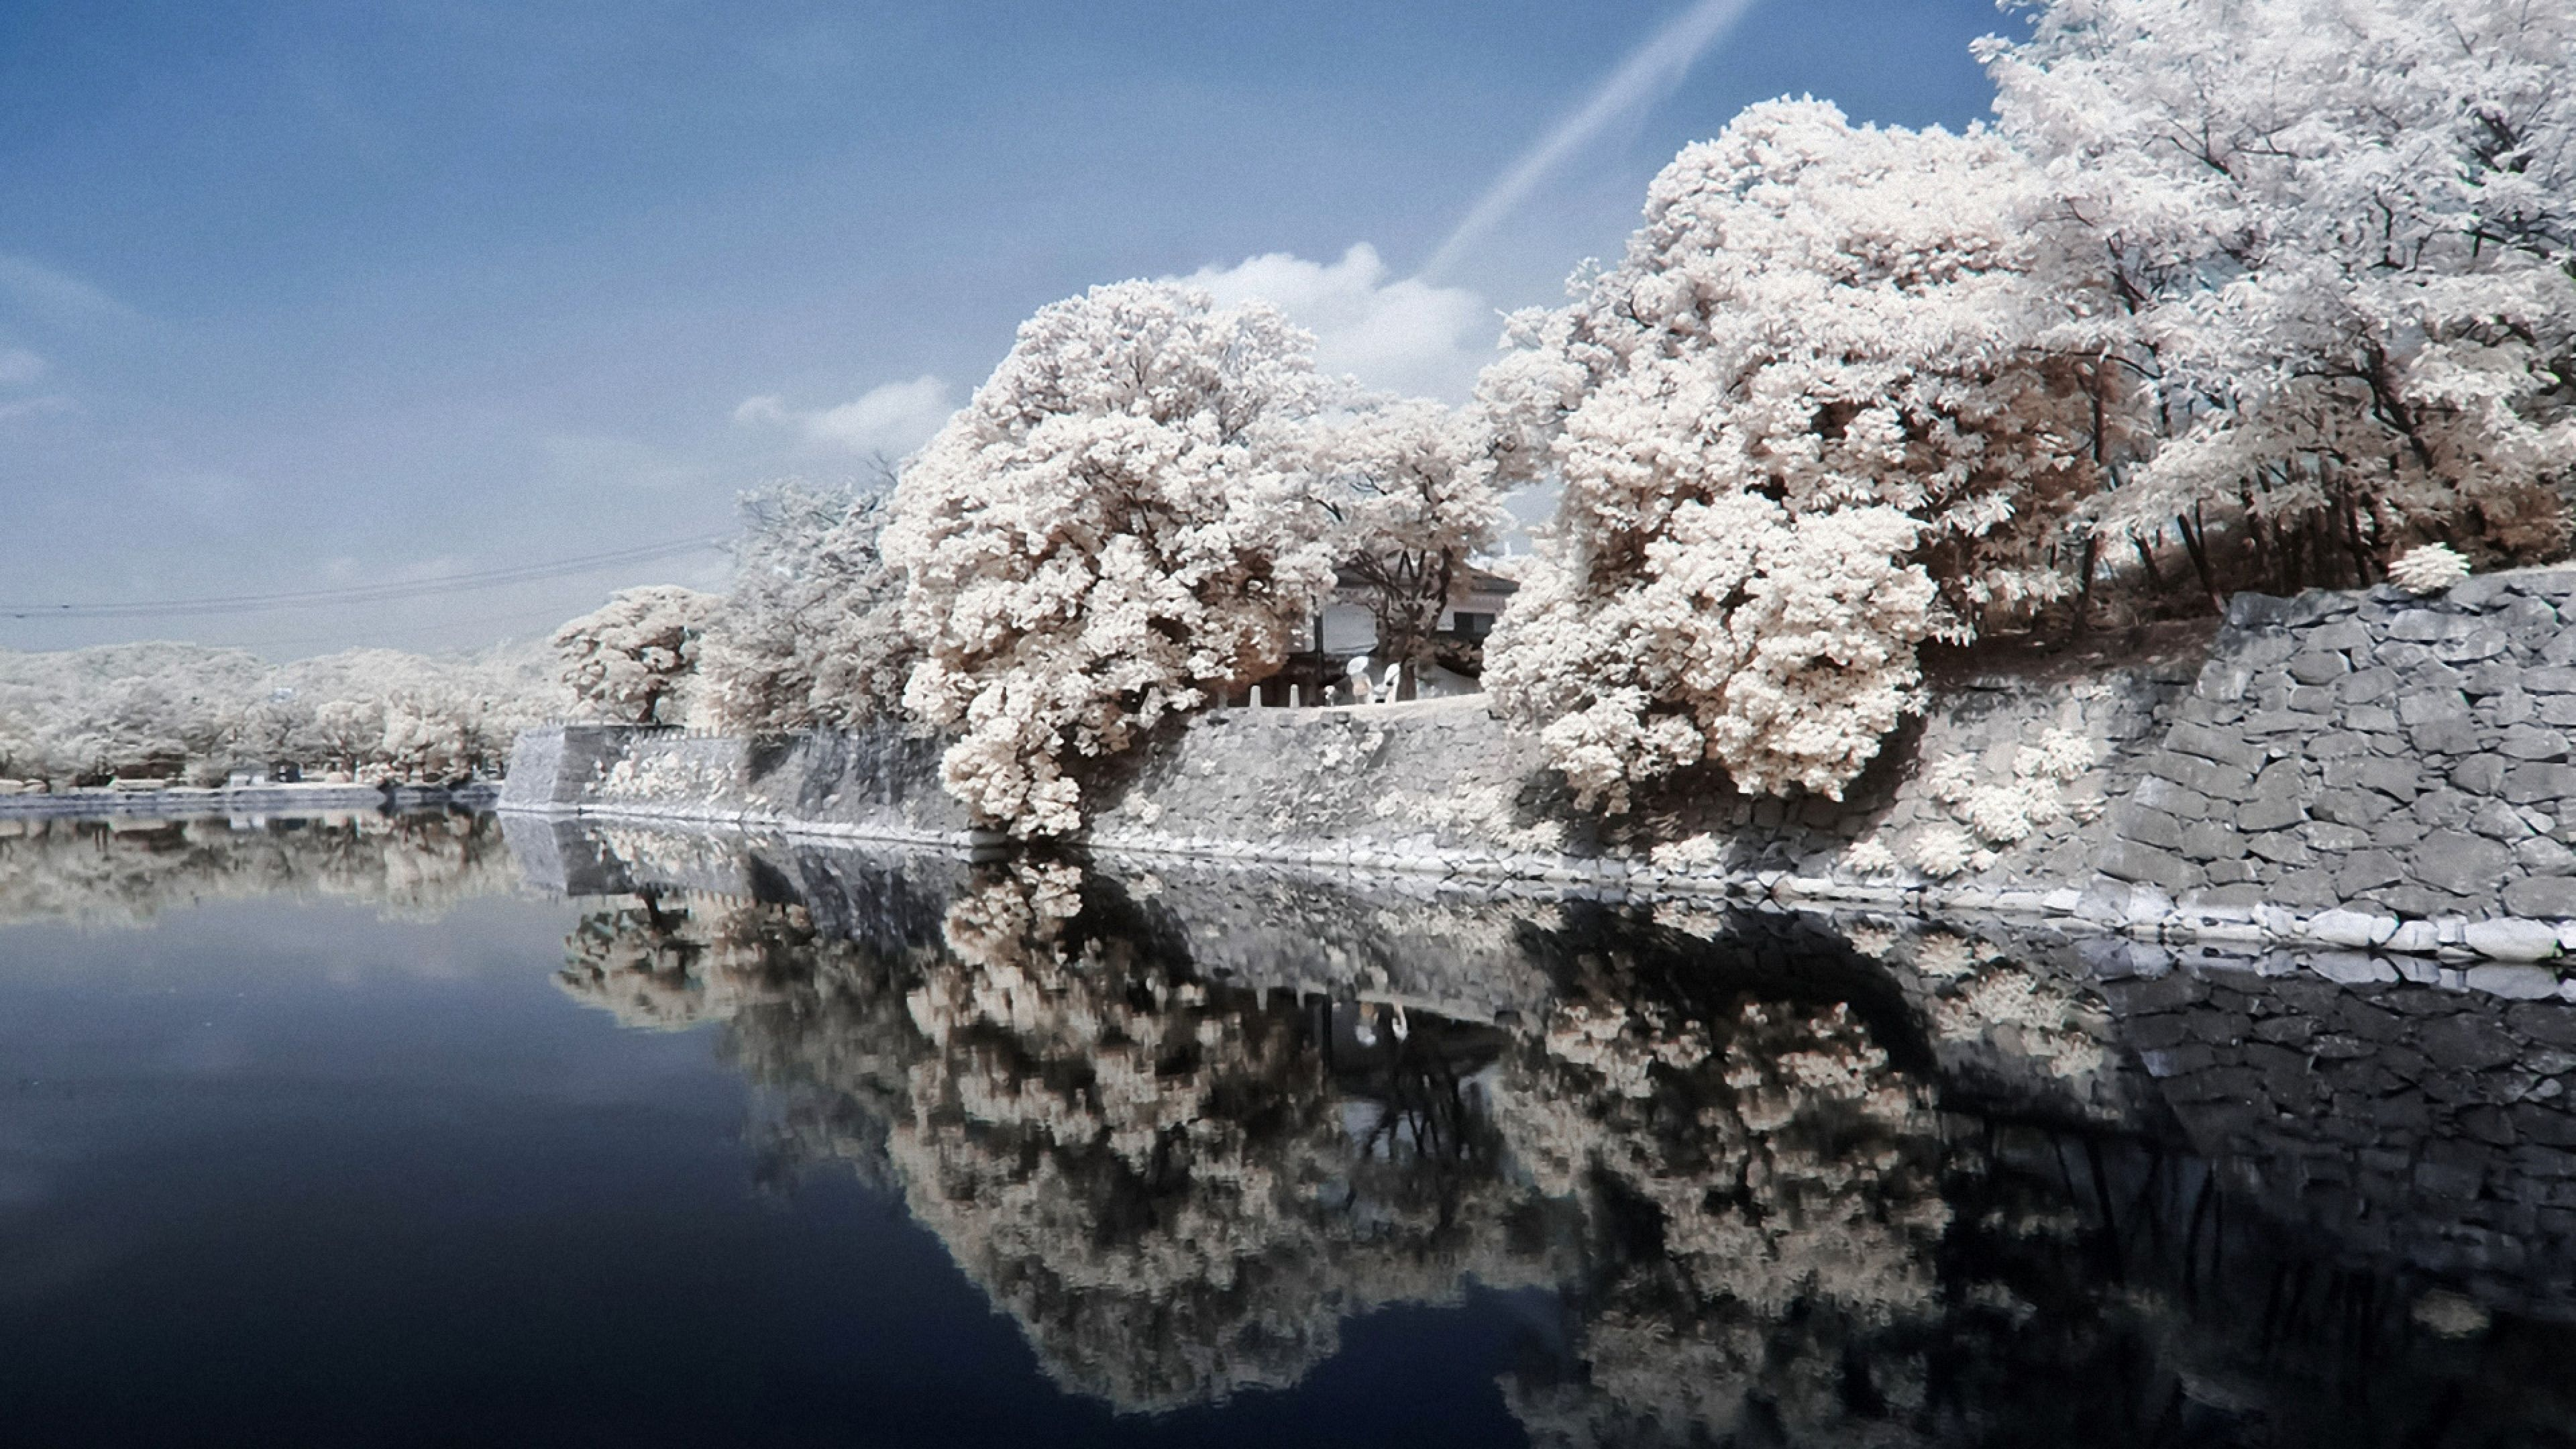 Japan 4k Wallpaper In 2020 Japan Landscape Tree Wallpaper Backgrounds Beautiful Photography Nature